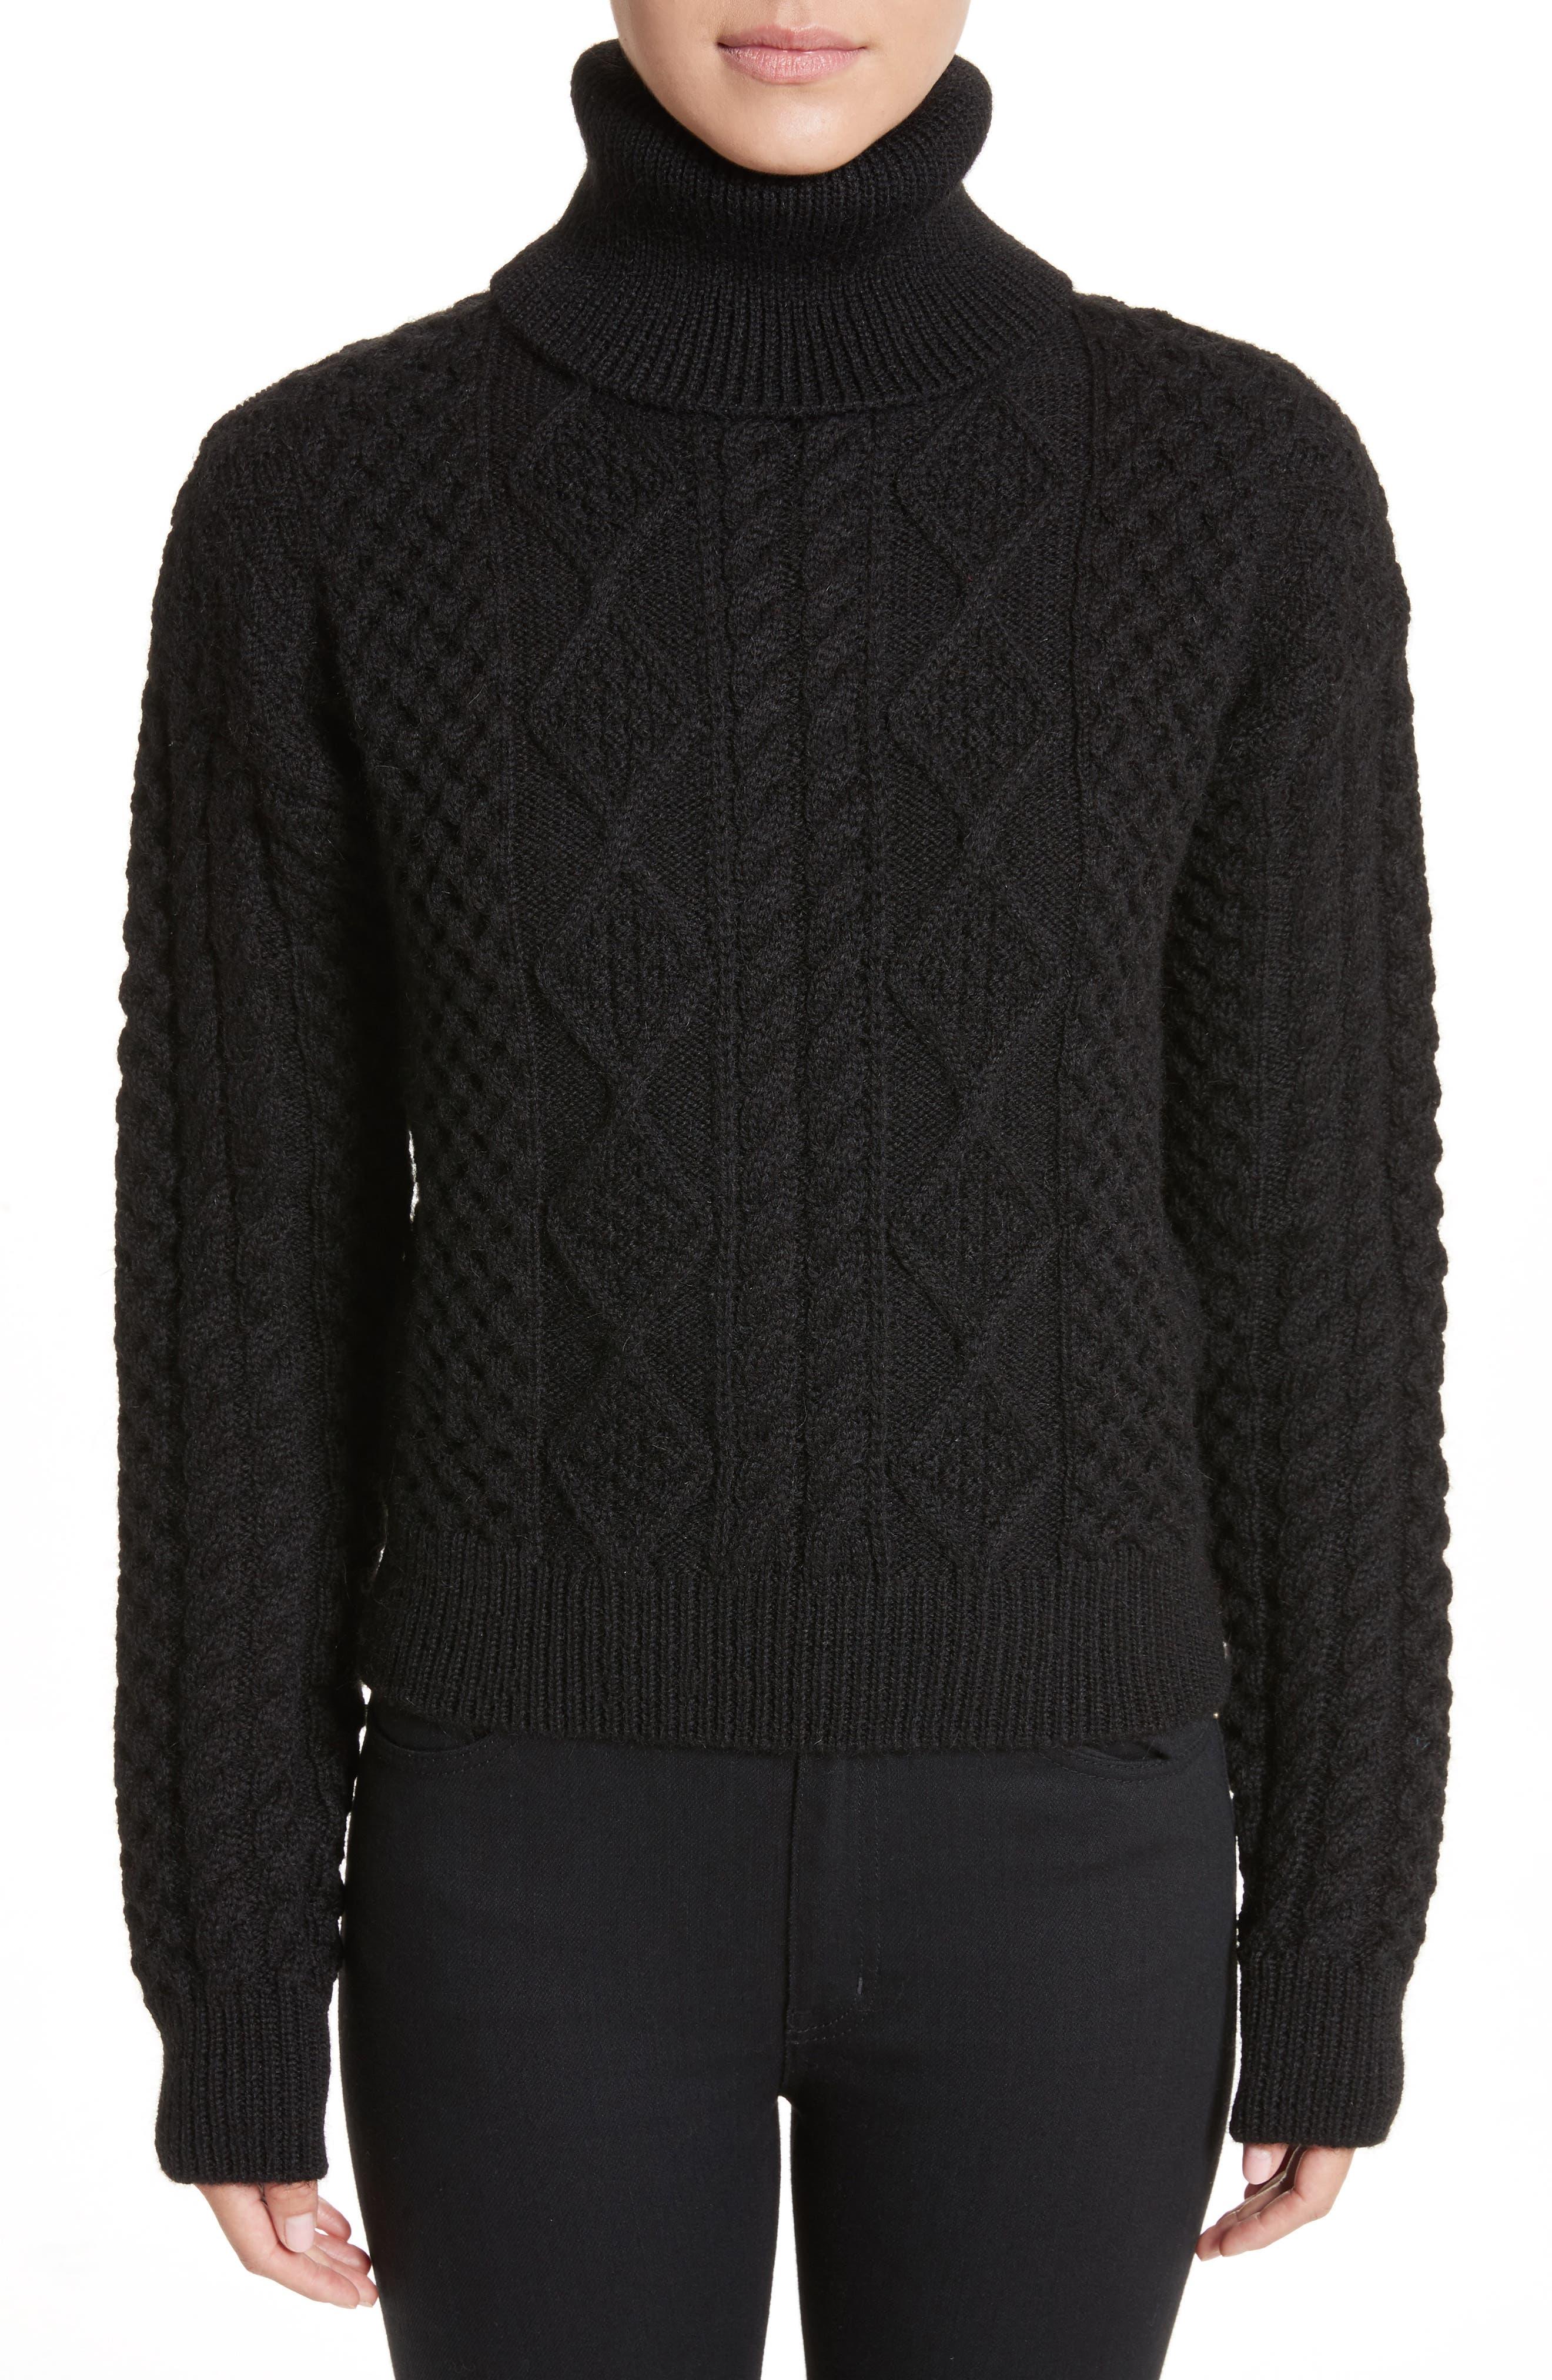 Alternate Image 1 Selected - Saint Laurent Cable Knit Wool Turtleneck Sweater